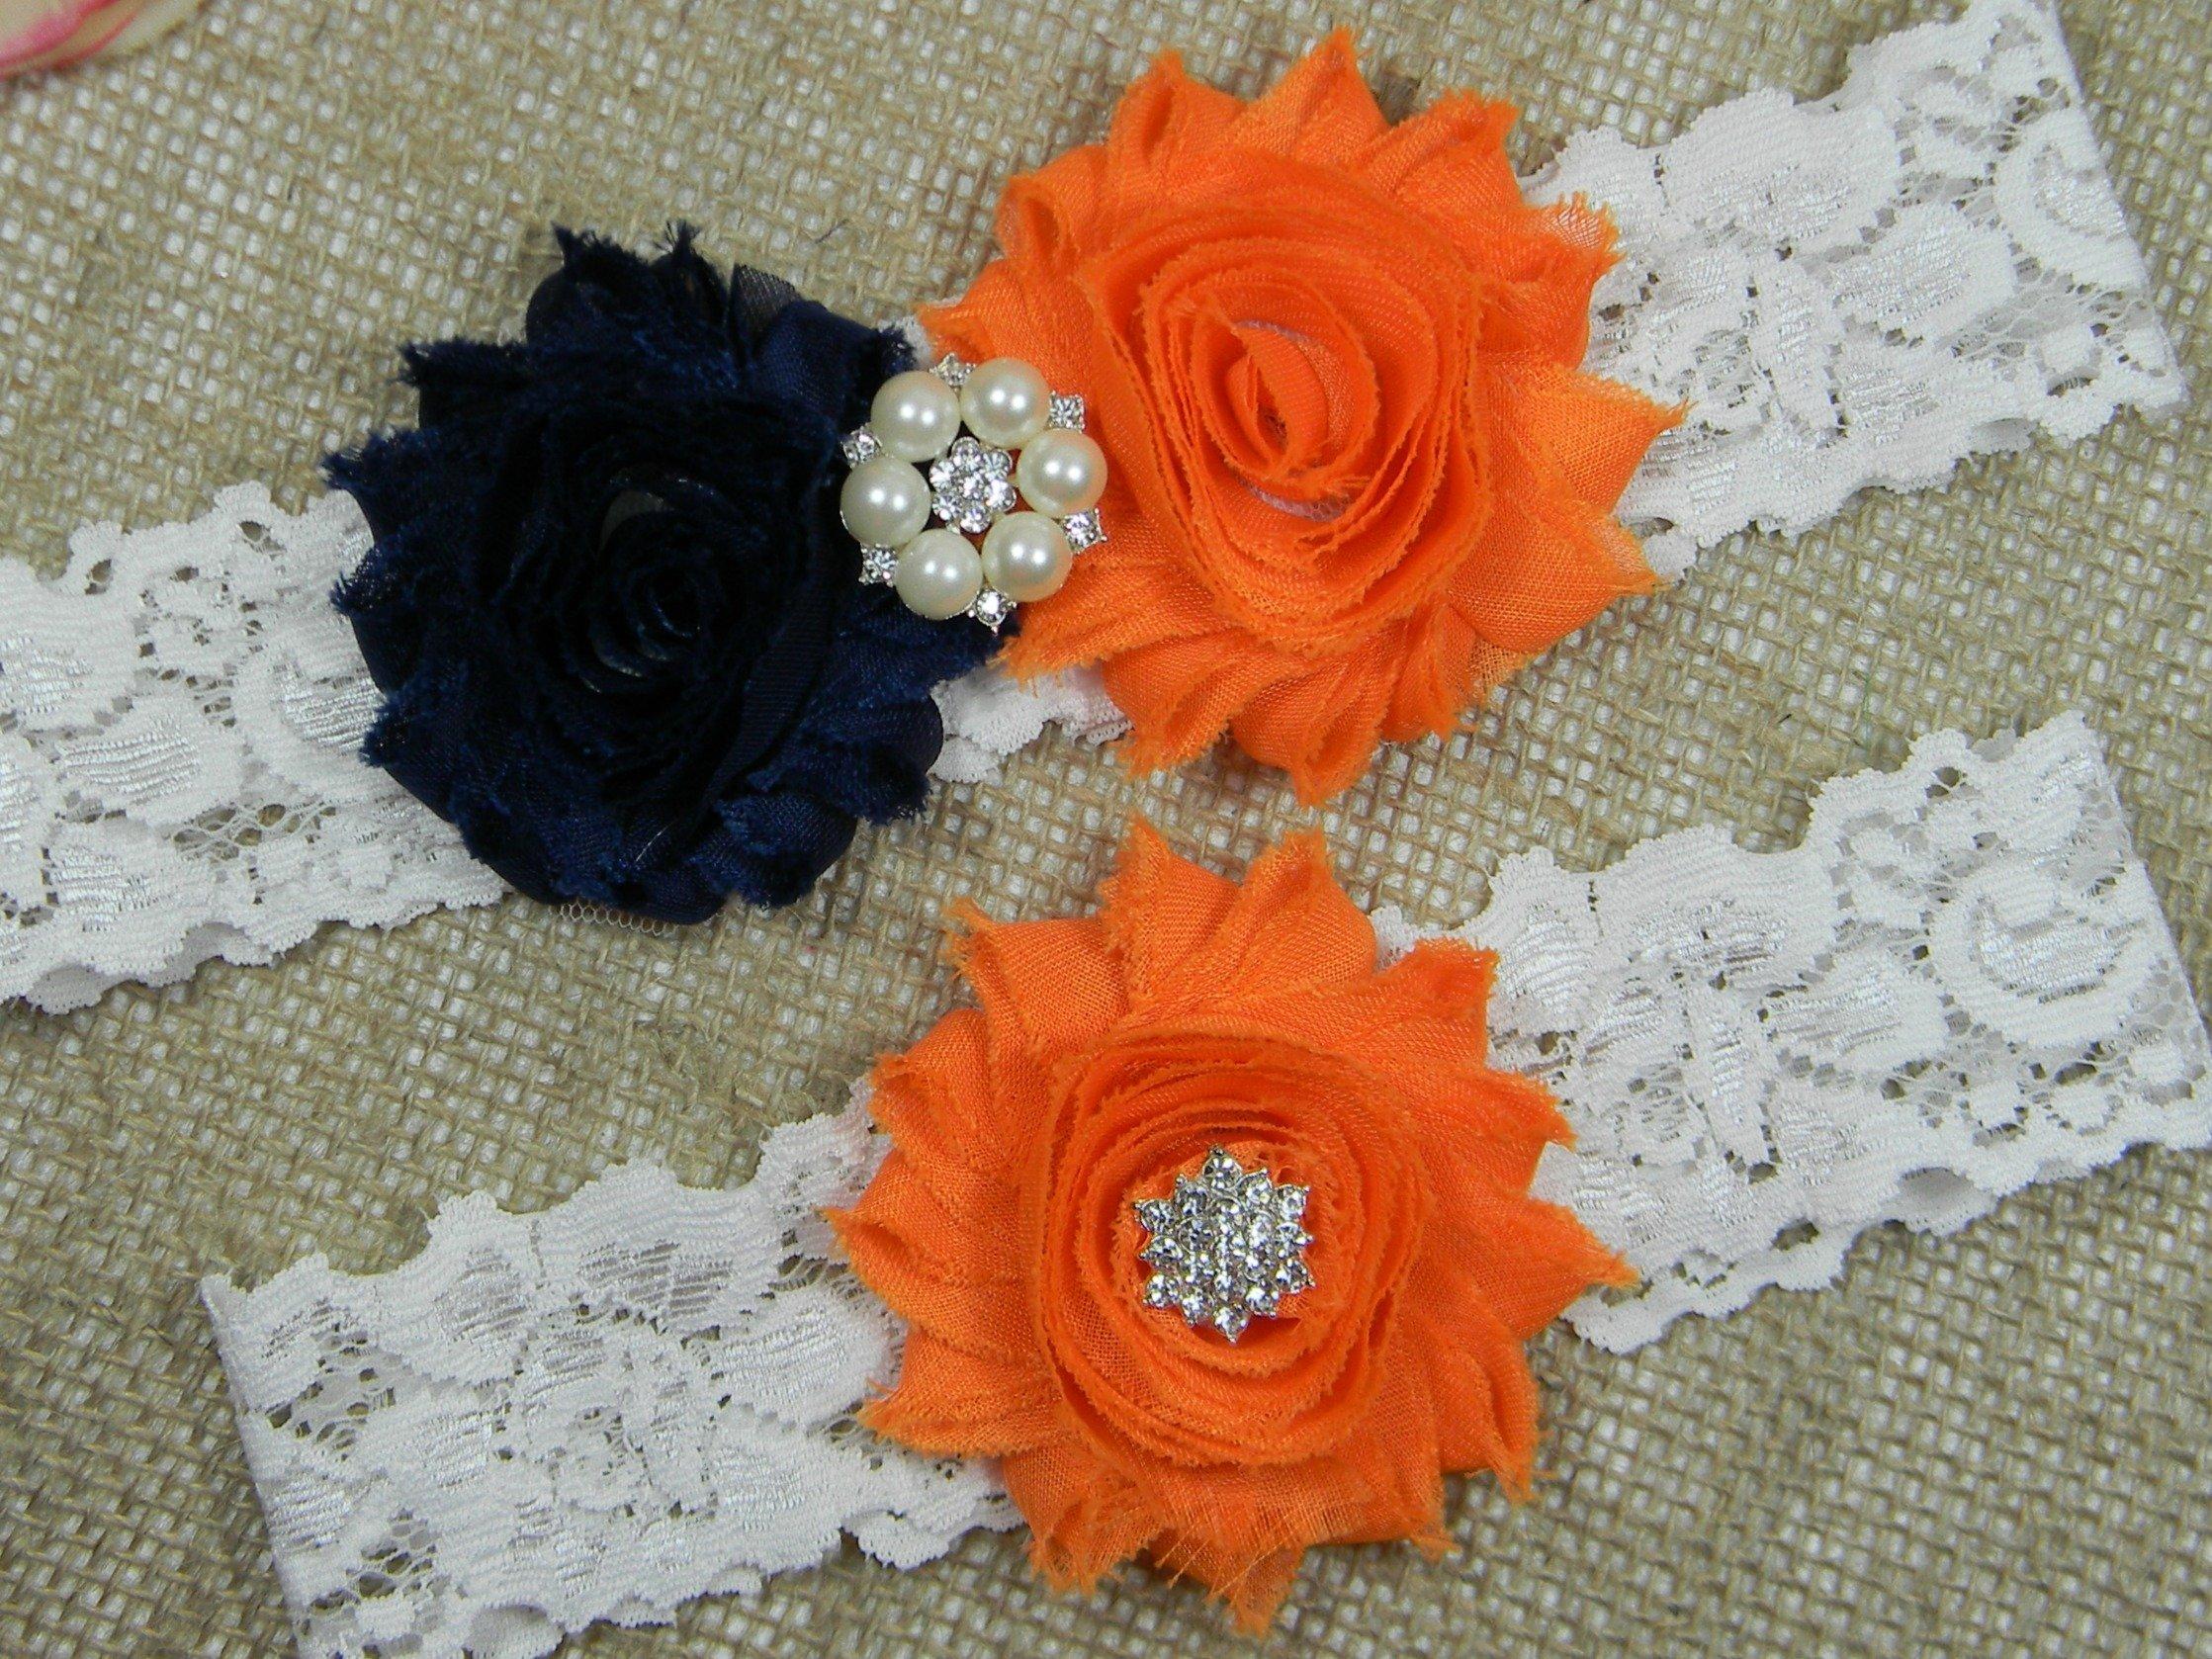 Navy Blue and Orange Garter, Wedding Garter Set, Bridal Garter Belt, Keepsake and Toss Stretch Lace Garters